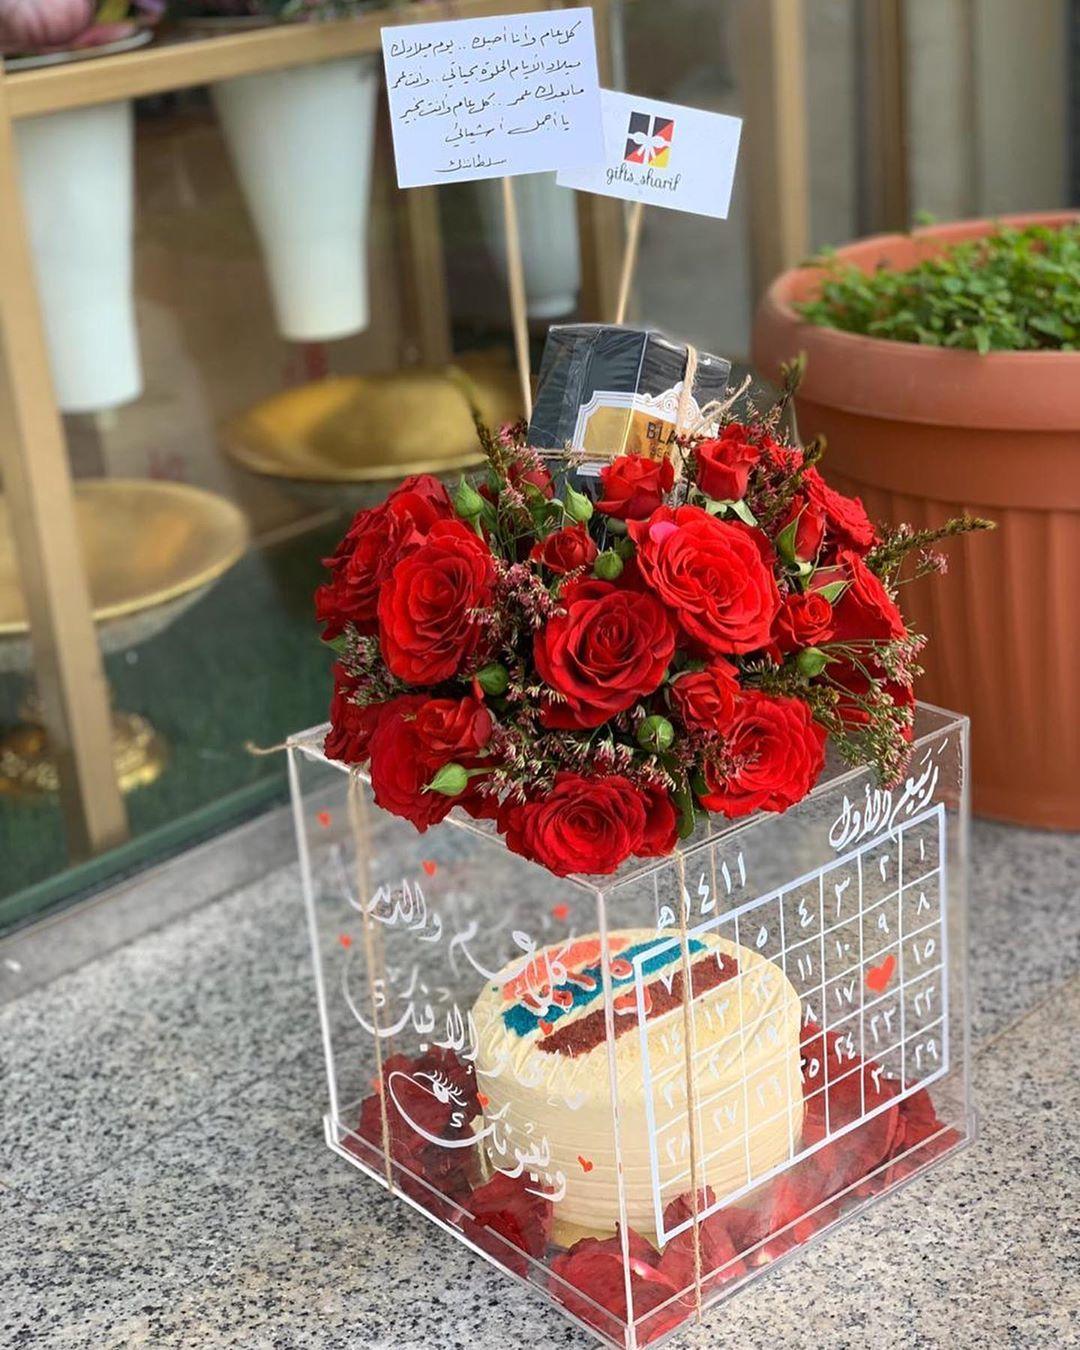 تنسيق وتوصيل هدايا توصيل مندوب لايكات بوكيه ورد هدية هديه هدايا الرياض تنسيق هديه Flower Shop Design Cloud Baby Shower Theme Gift Wraping